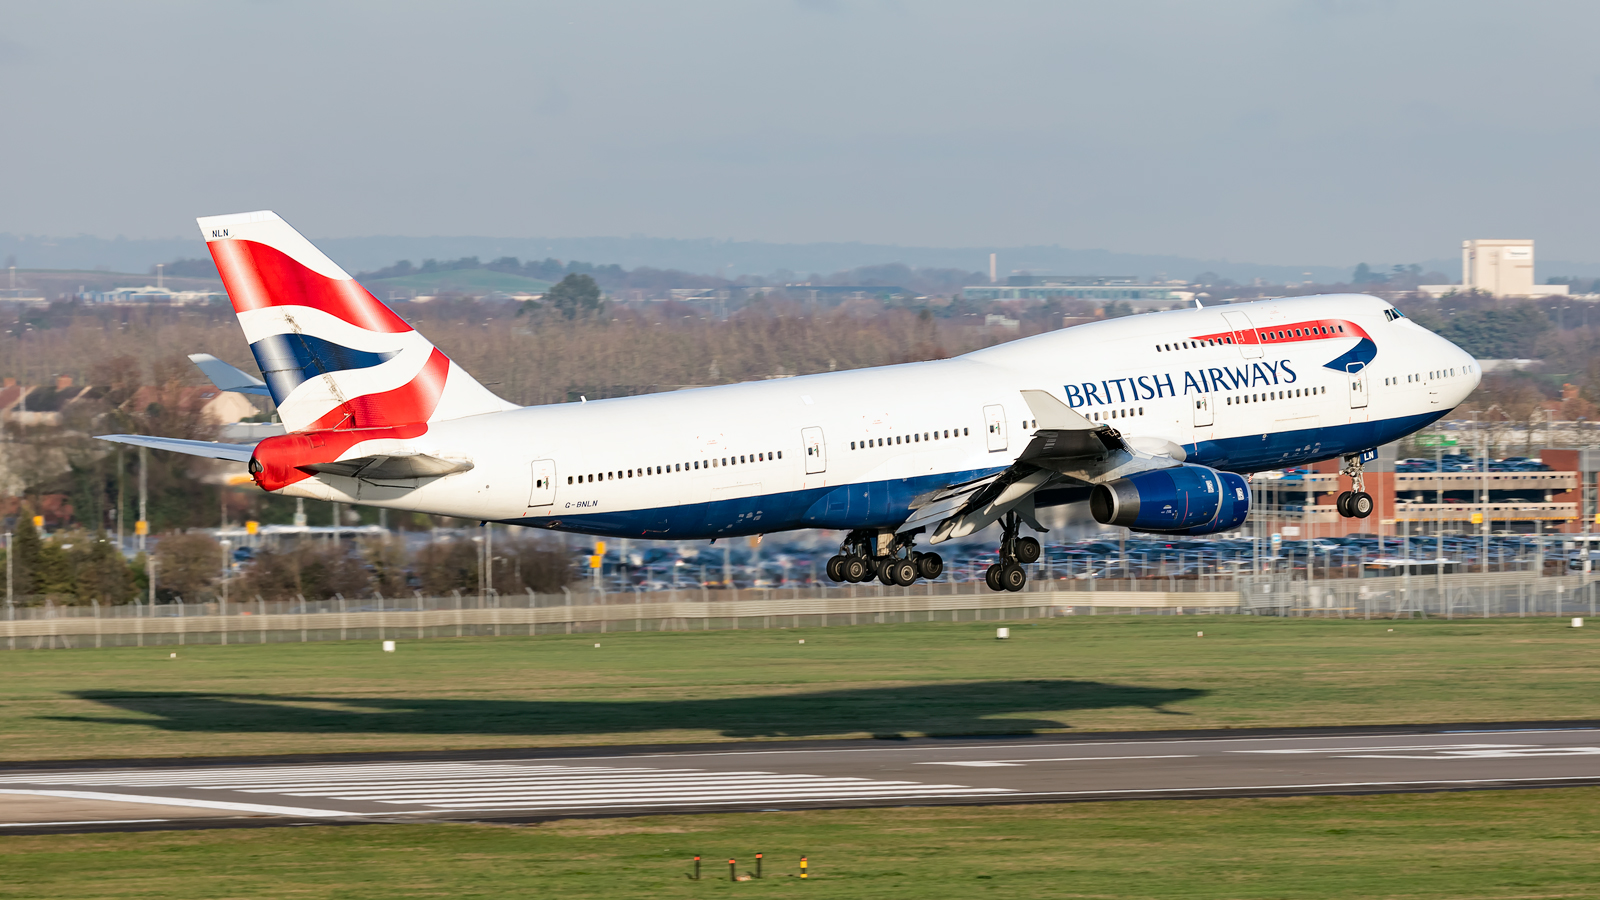 Click image for larger version.  Name:BA-744-shadow-landing-web-copy.jpg Views:32 Size:781.9 KB ID:20888